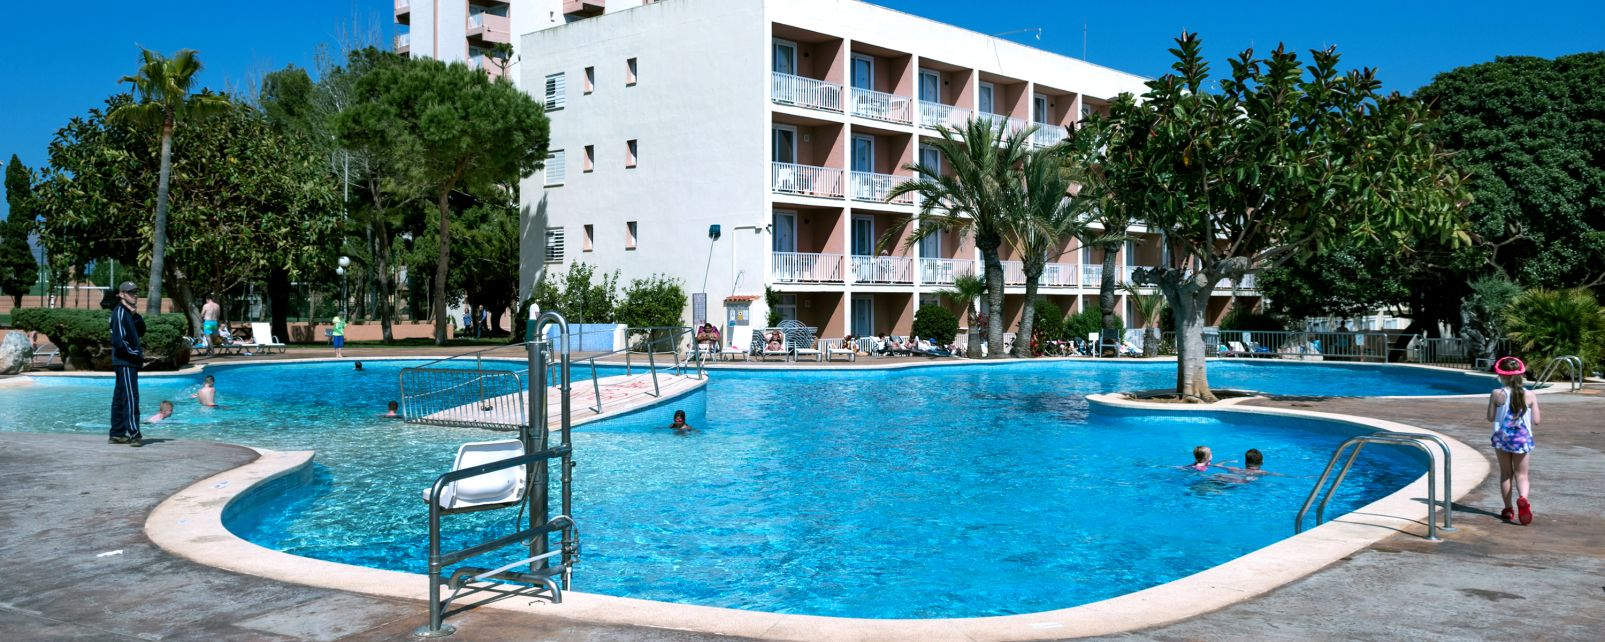 Hotel Maxi Club Eurocalas